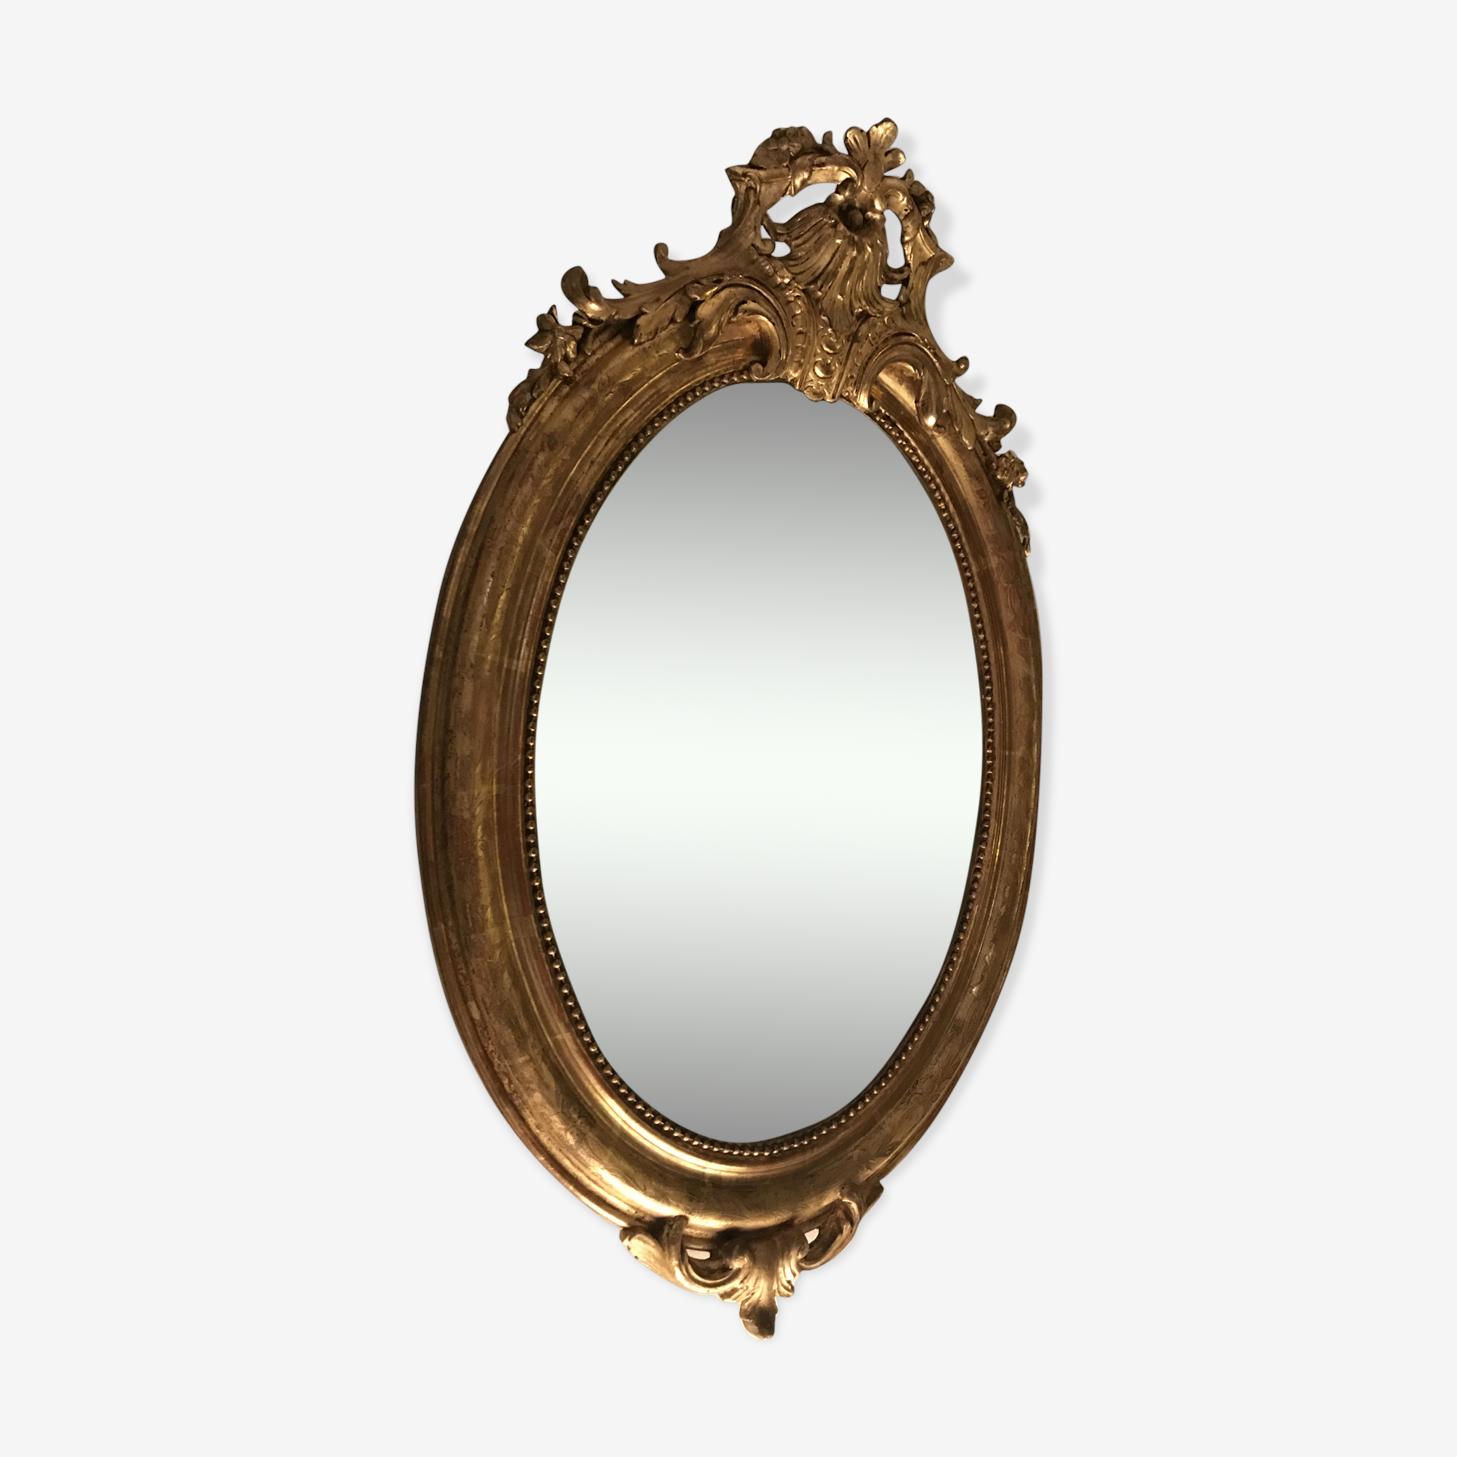 Miroir ovale Louis XVI feuille d'or